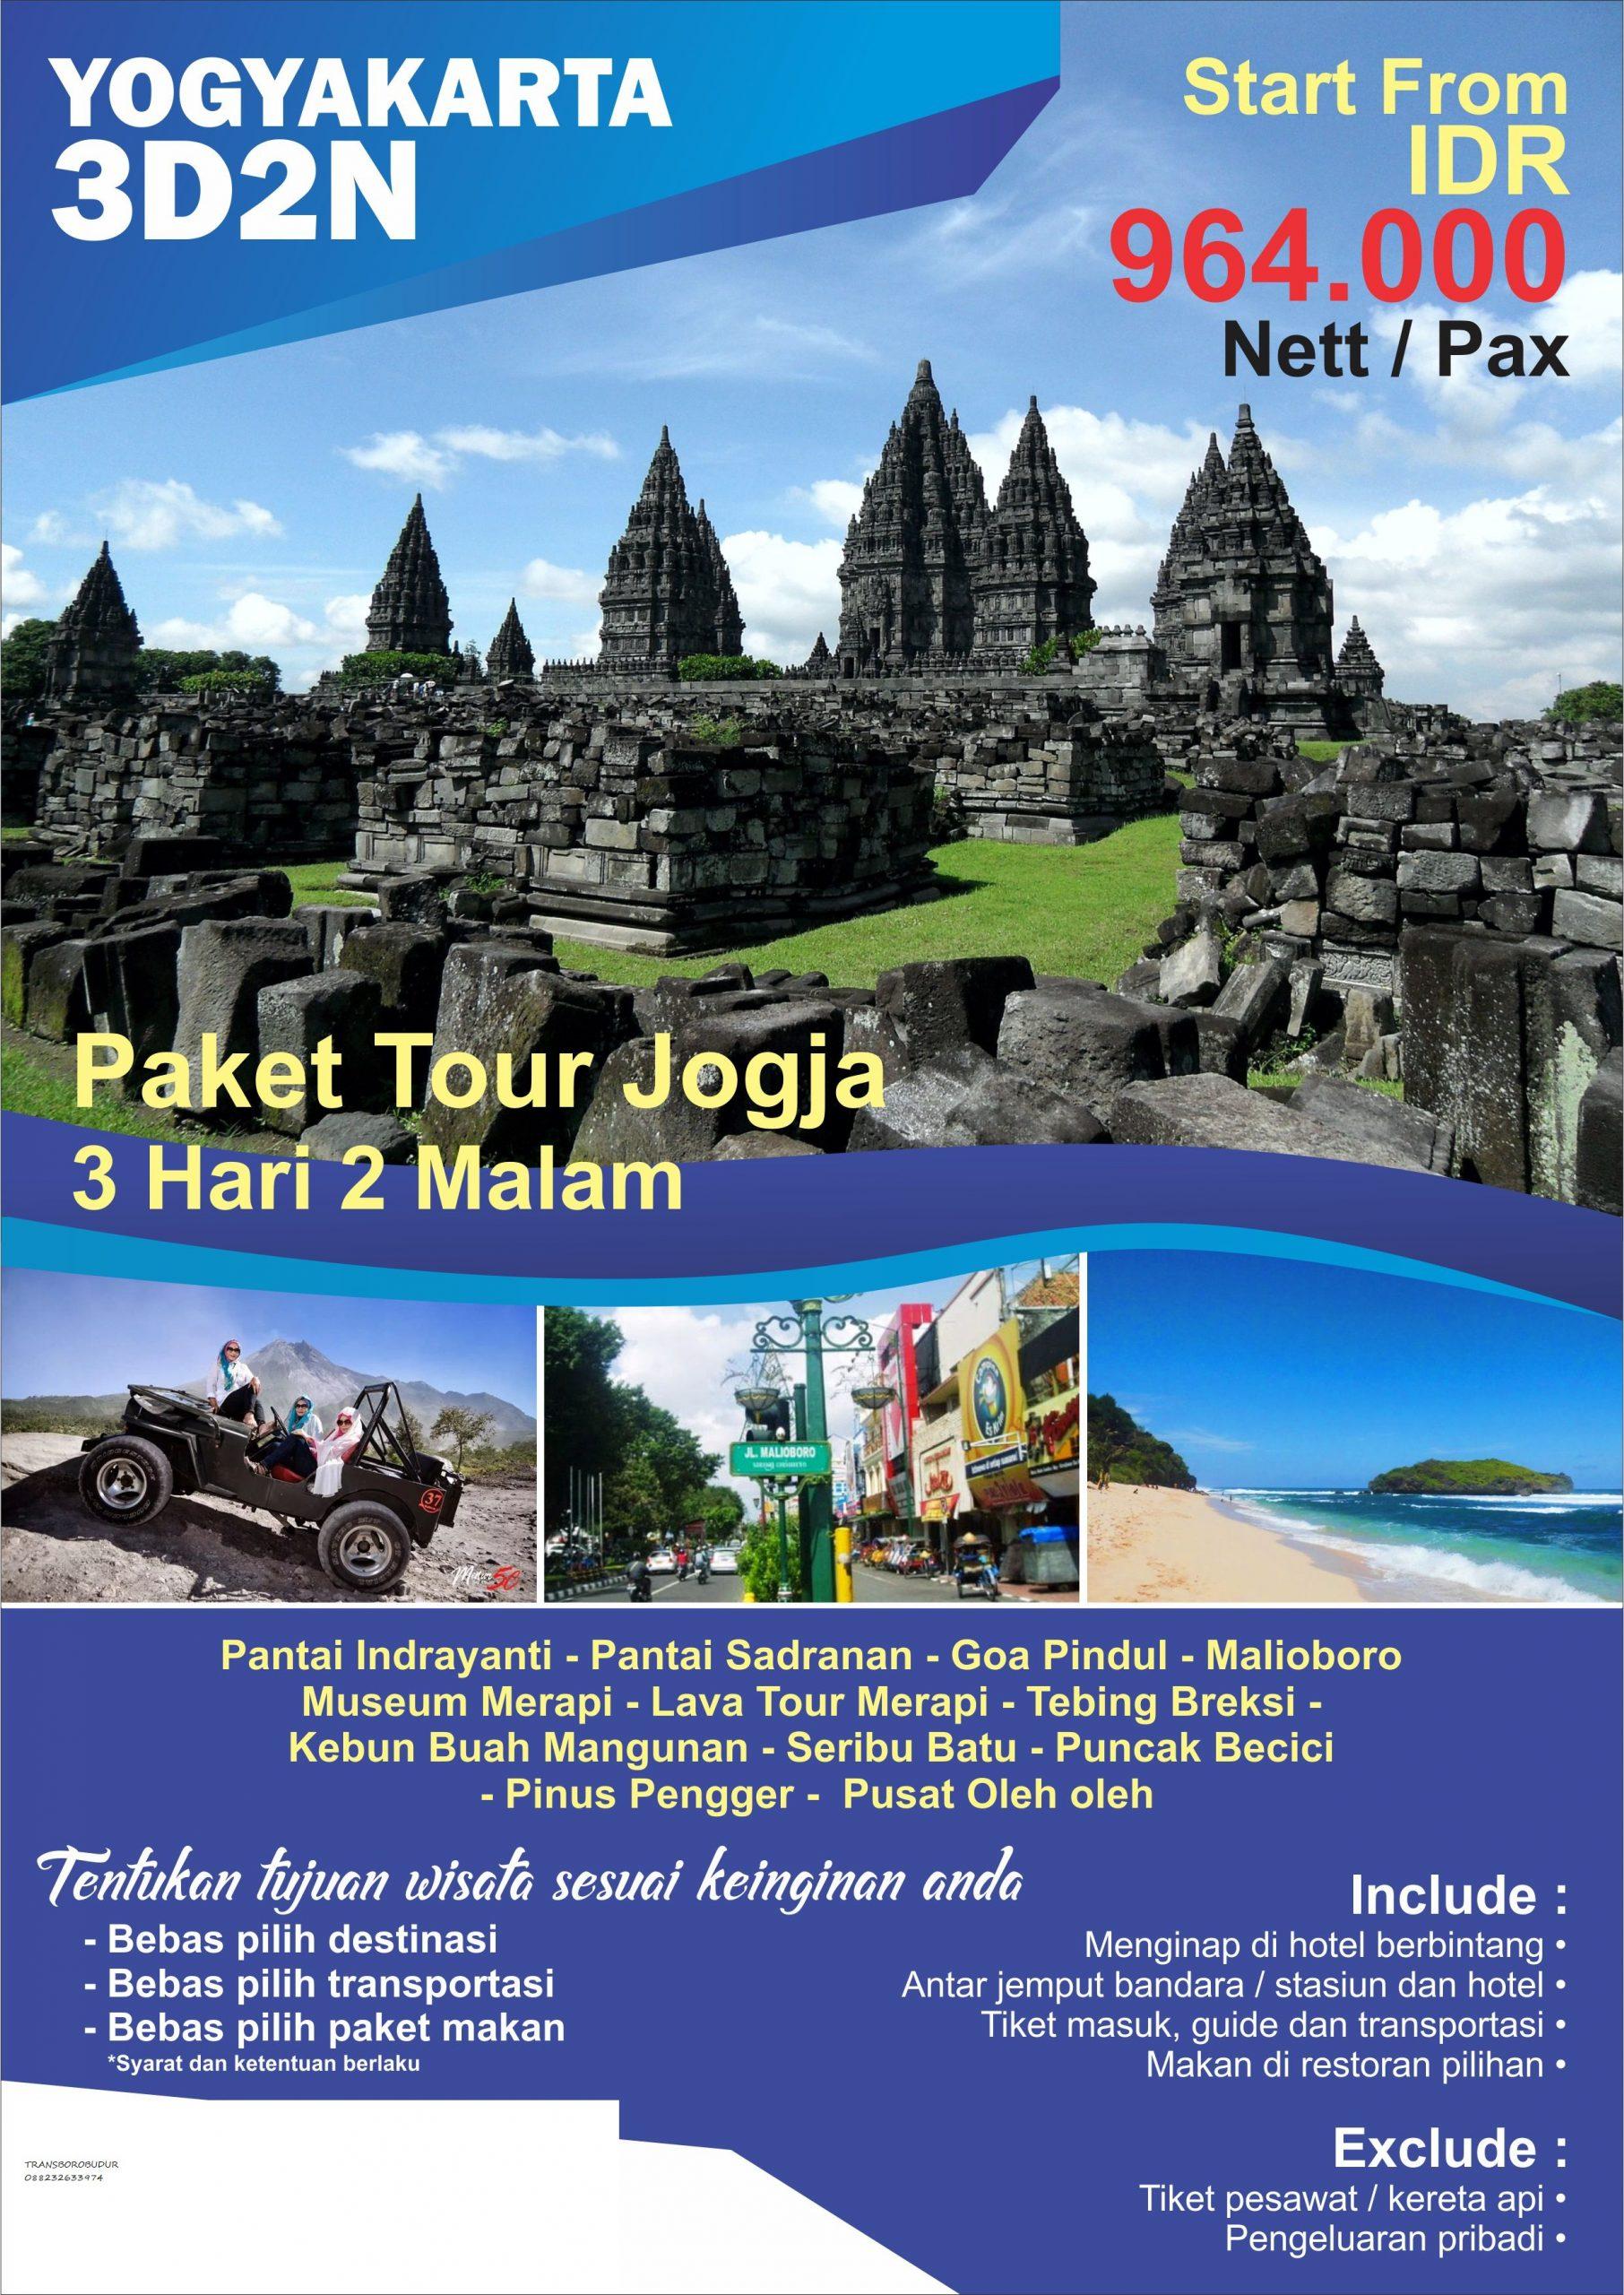 Harga Paket Wisata Di Jogja 2019 Yogyakarta Transborobudur 62 88232633974 Tour Outbound Borobudur